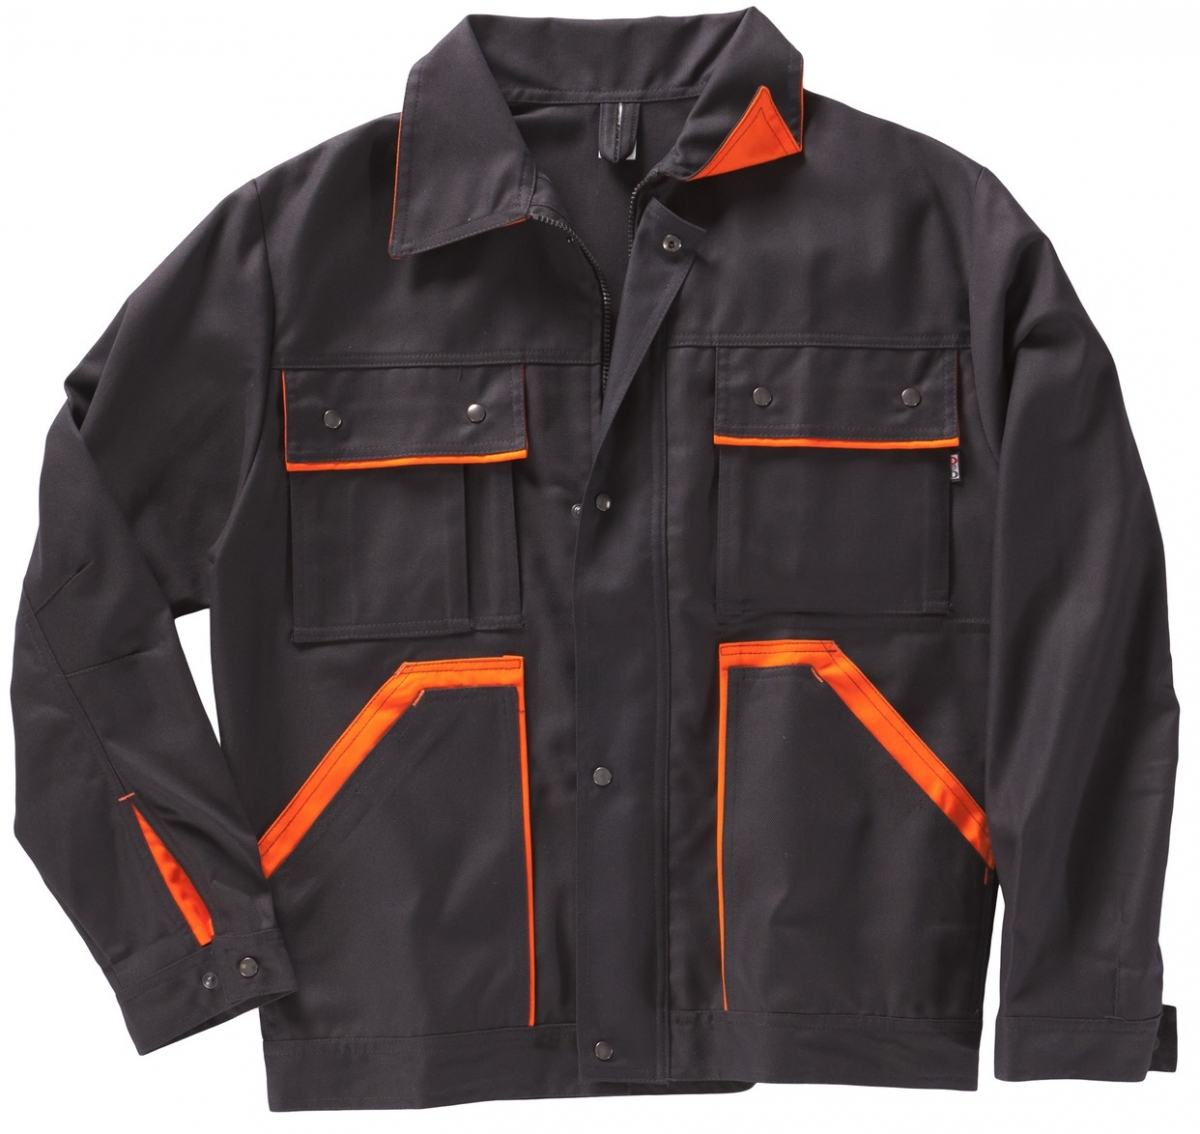 BEB-Bundjacke, Arbeits-Berufs-Jacke, Premium, MG 325, schwarz/orange